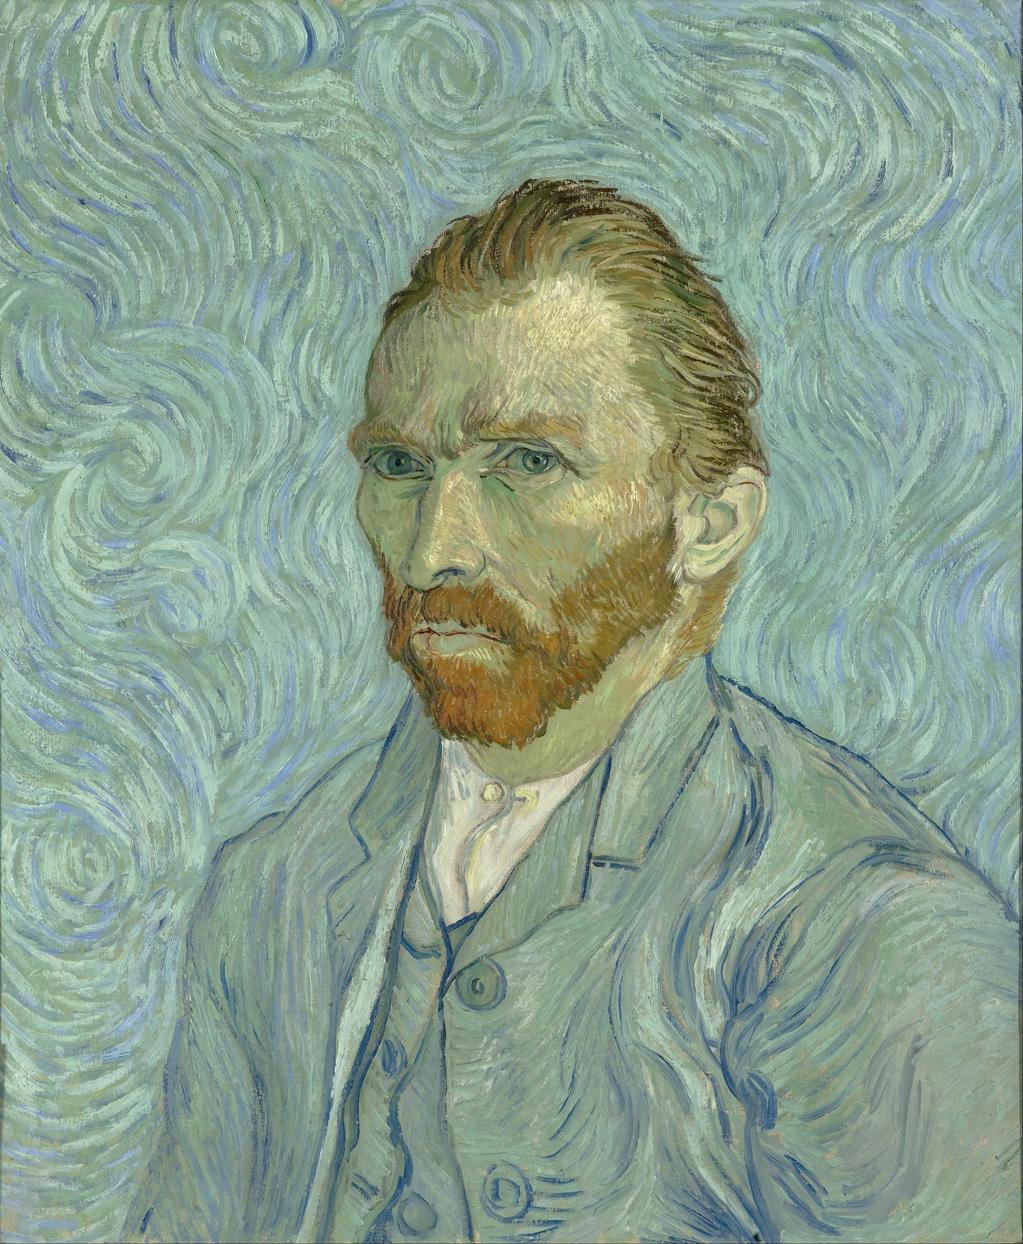 Van Gogh self-portrait (1889)